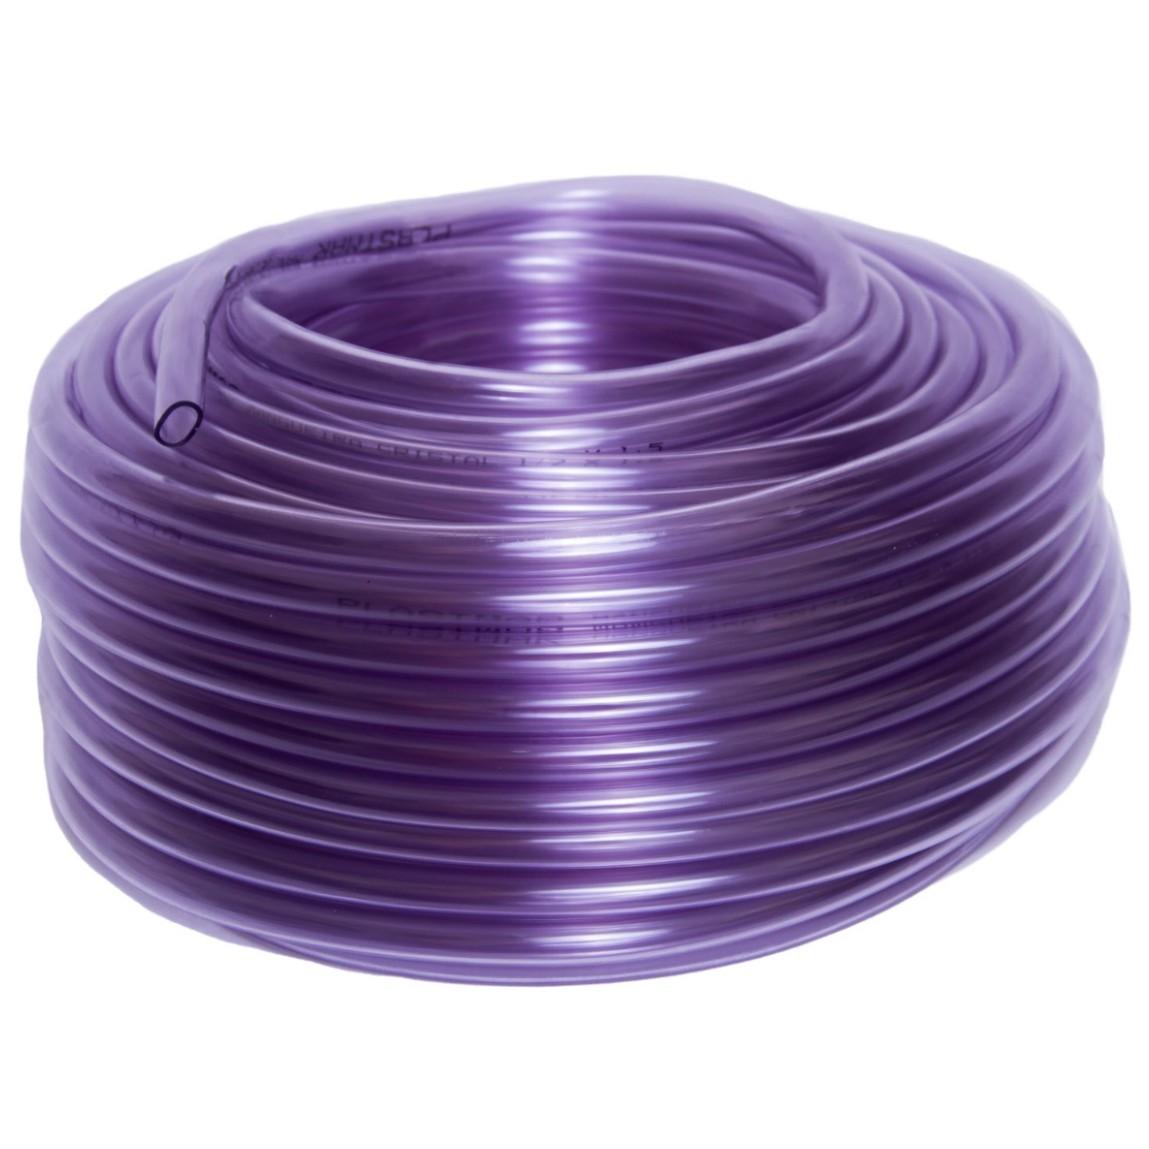 Mangueira de PVC 30m 34 Roxa 805 - Plastmar